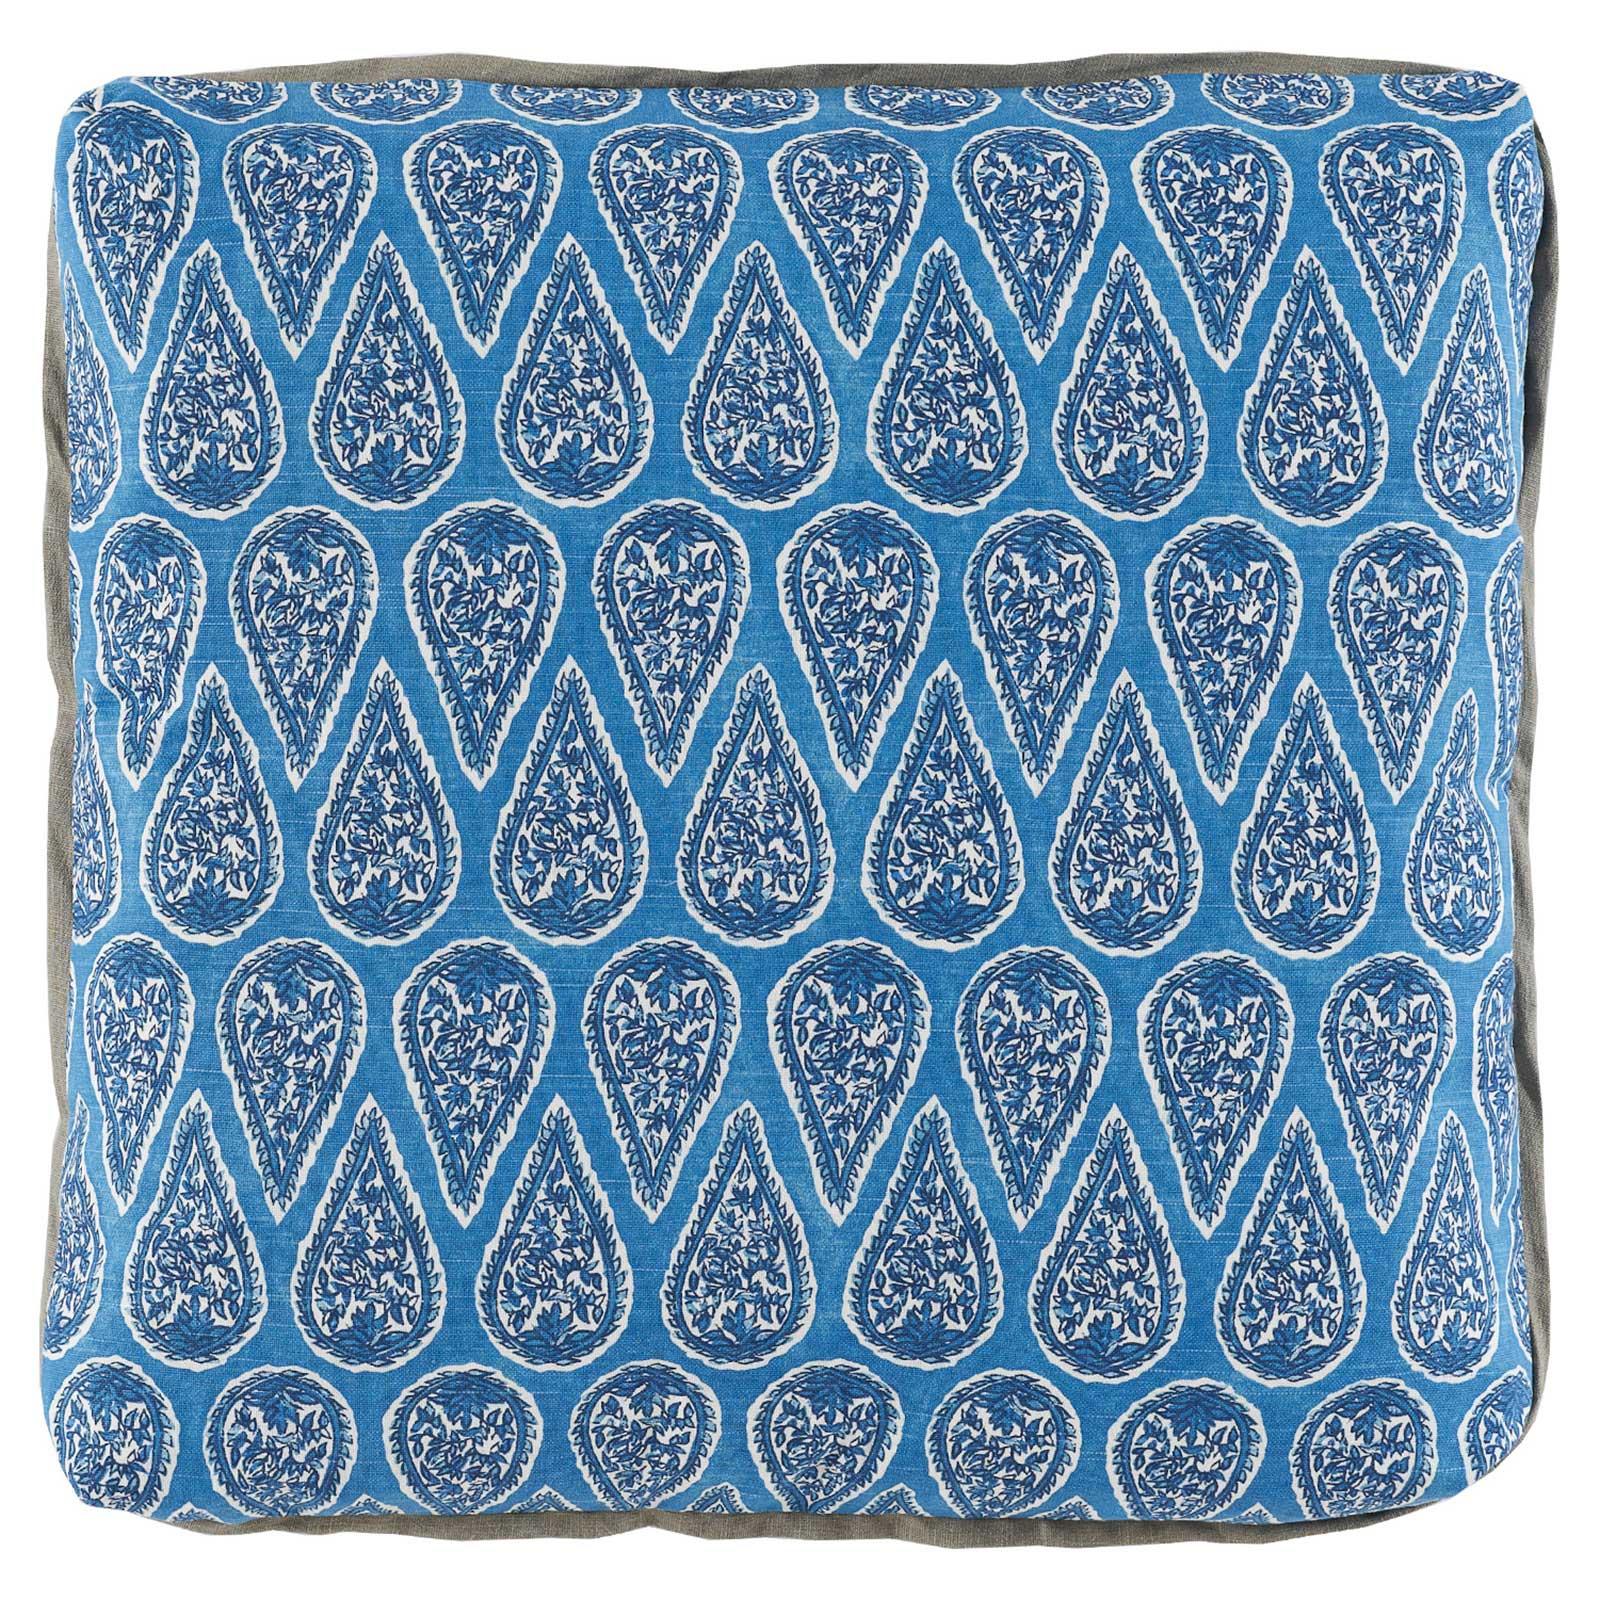 Eleni Global Bazaar Blue Paisley Block Pillow - 24x24